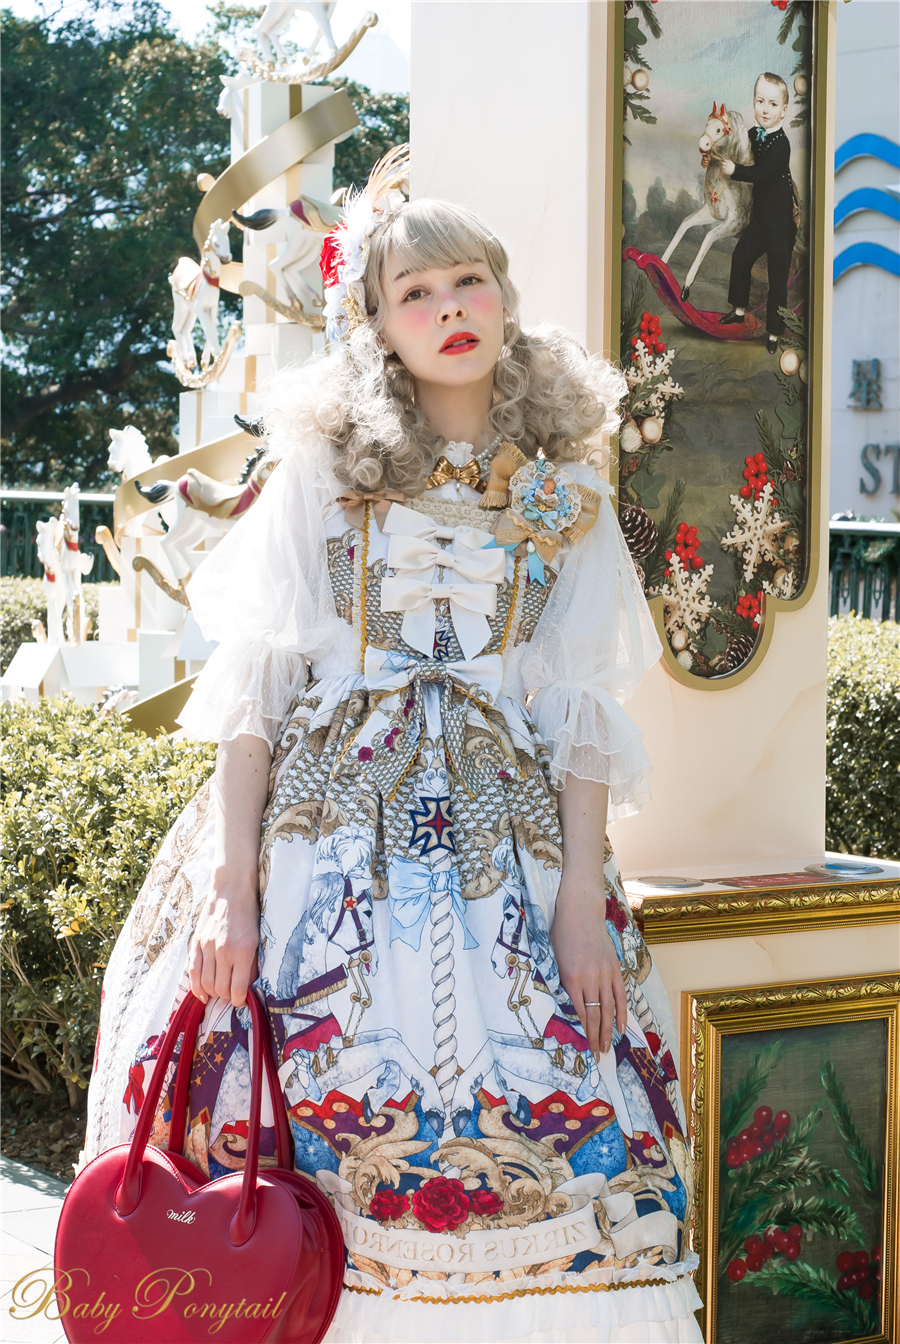 Baby Ponytail_Circus Princess_Silver JSK_Claudia12.jpg